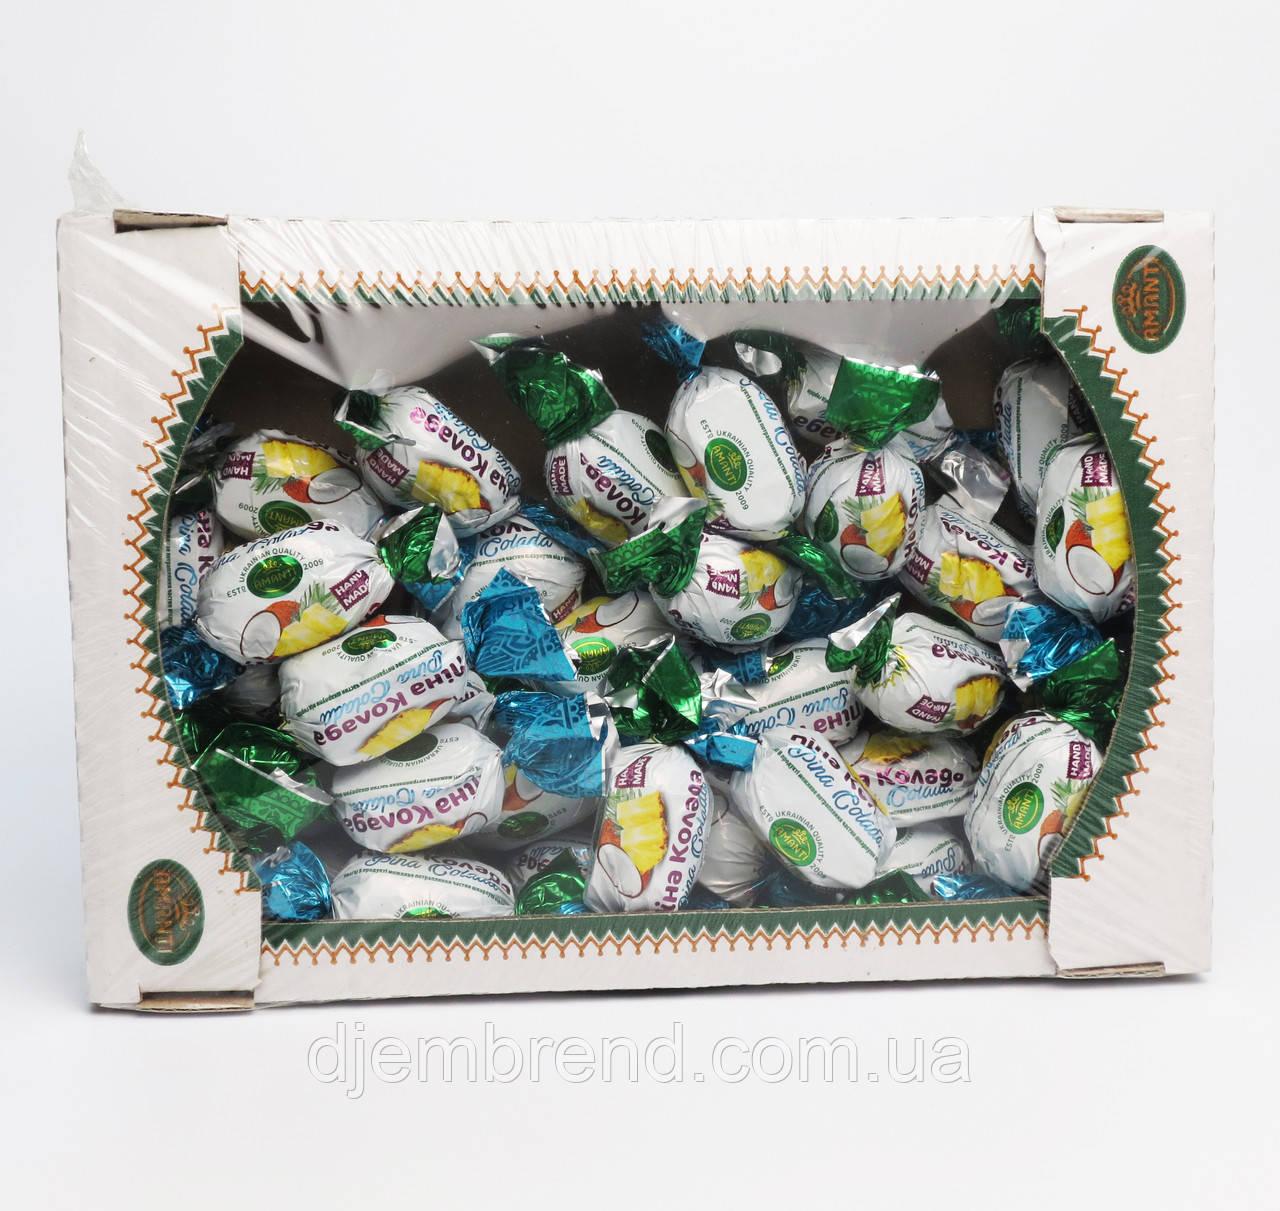 "Конфеты ""Пина колада"", Amanti, Украина, 1 кг."